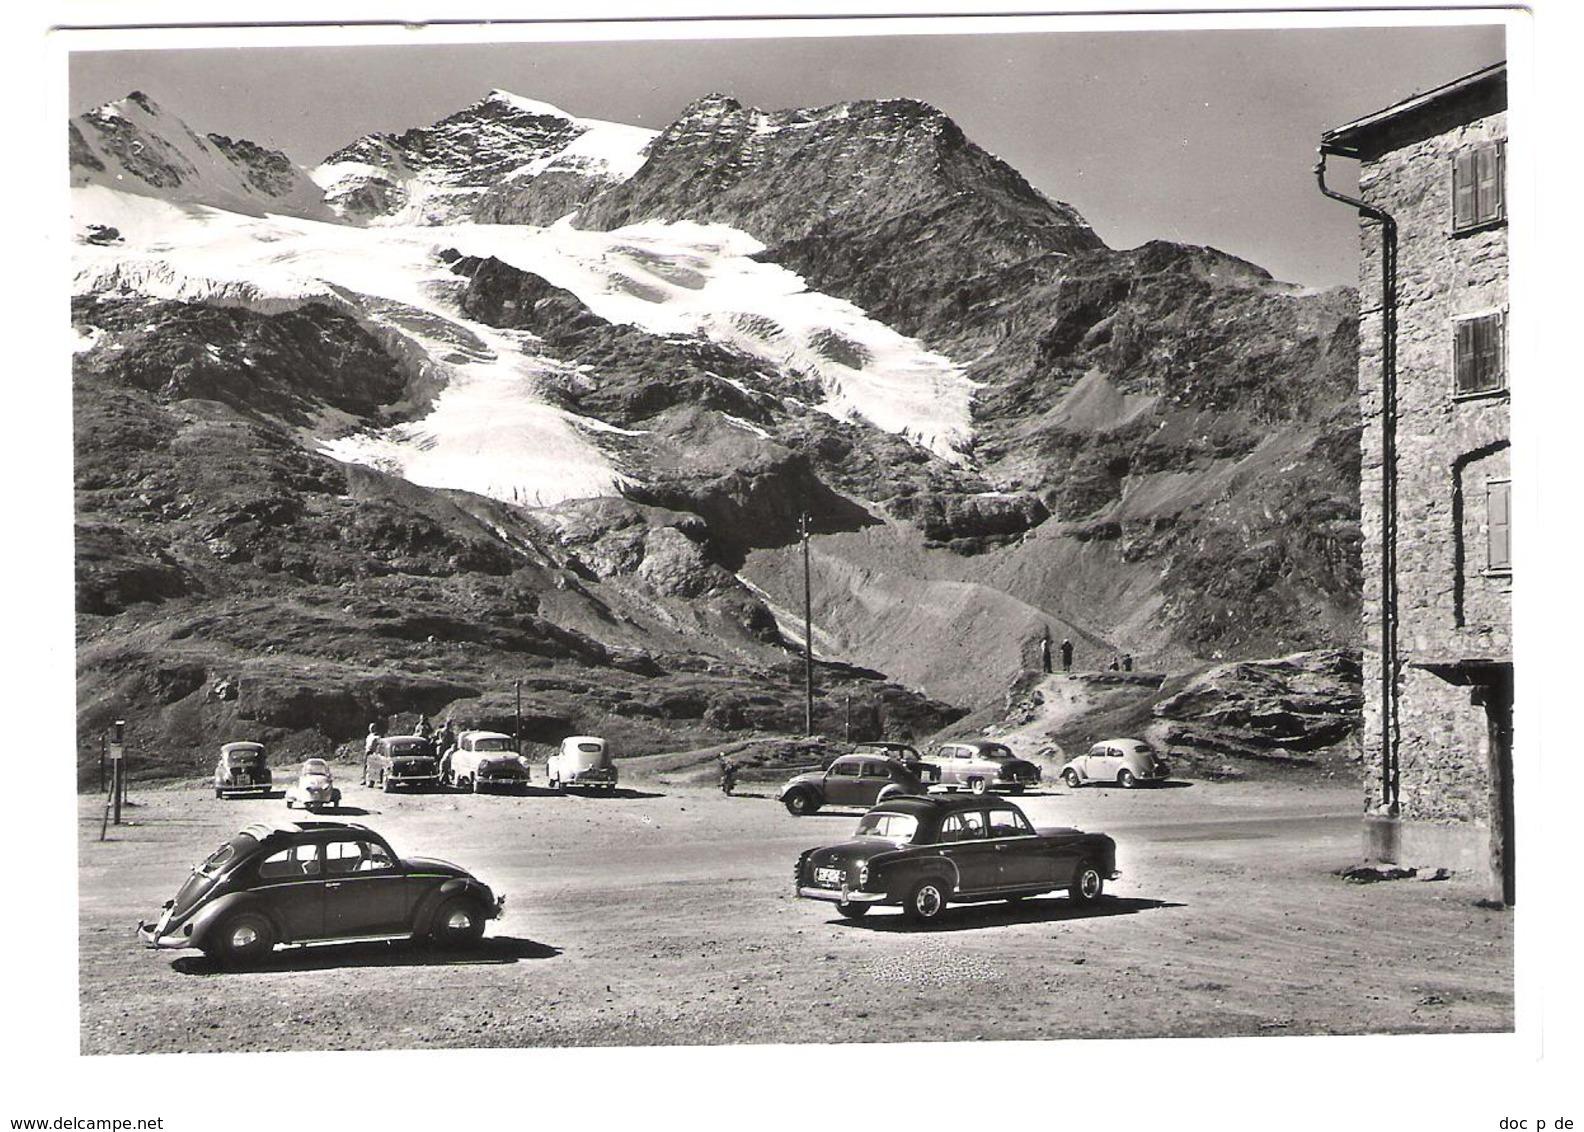 Schweiz - Bernina Hospiz Mit Piz Cambrena - Autos - Oldtimer - Cars - VW Kaefer - GR Graubünden